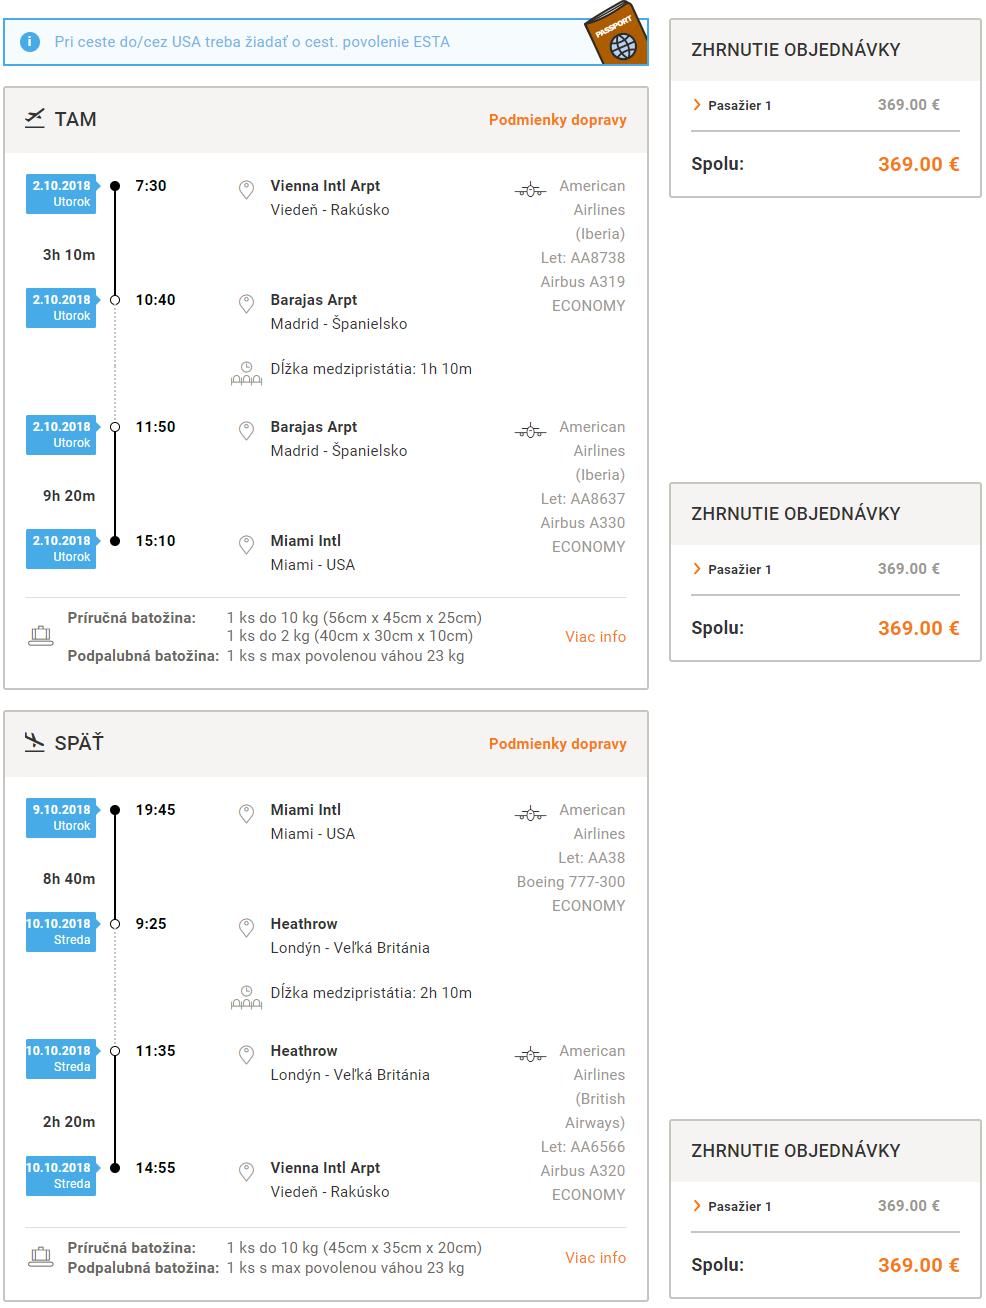 Miami lacno z Viedne s letenkami od 369 eur